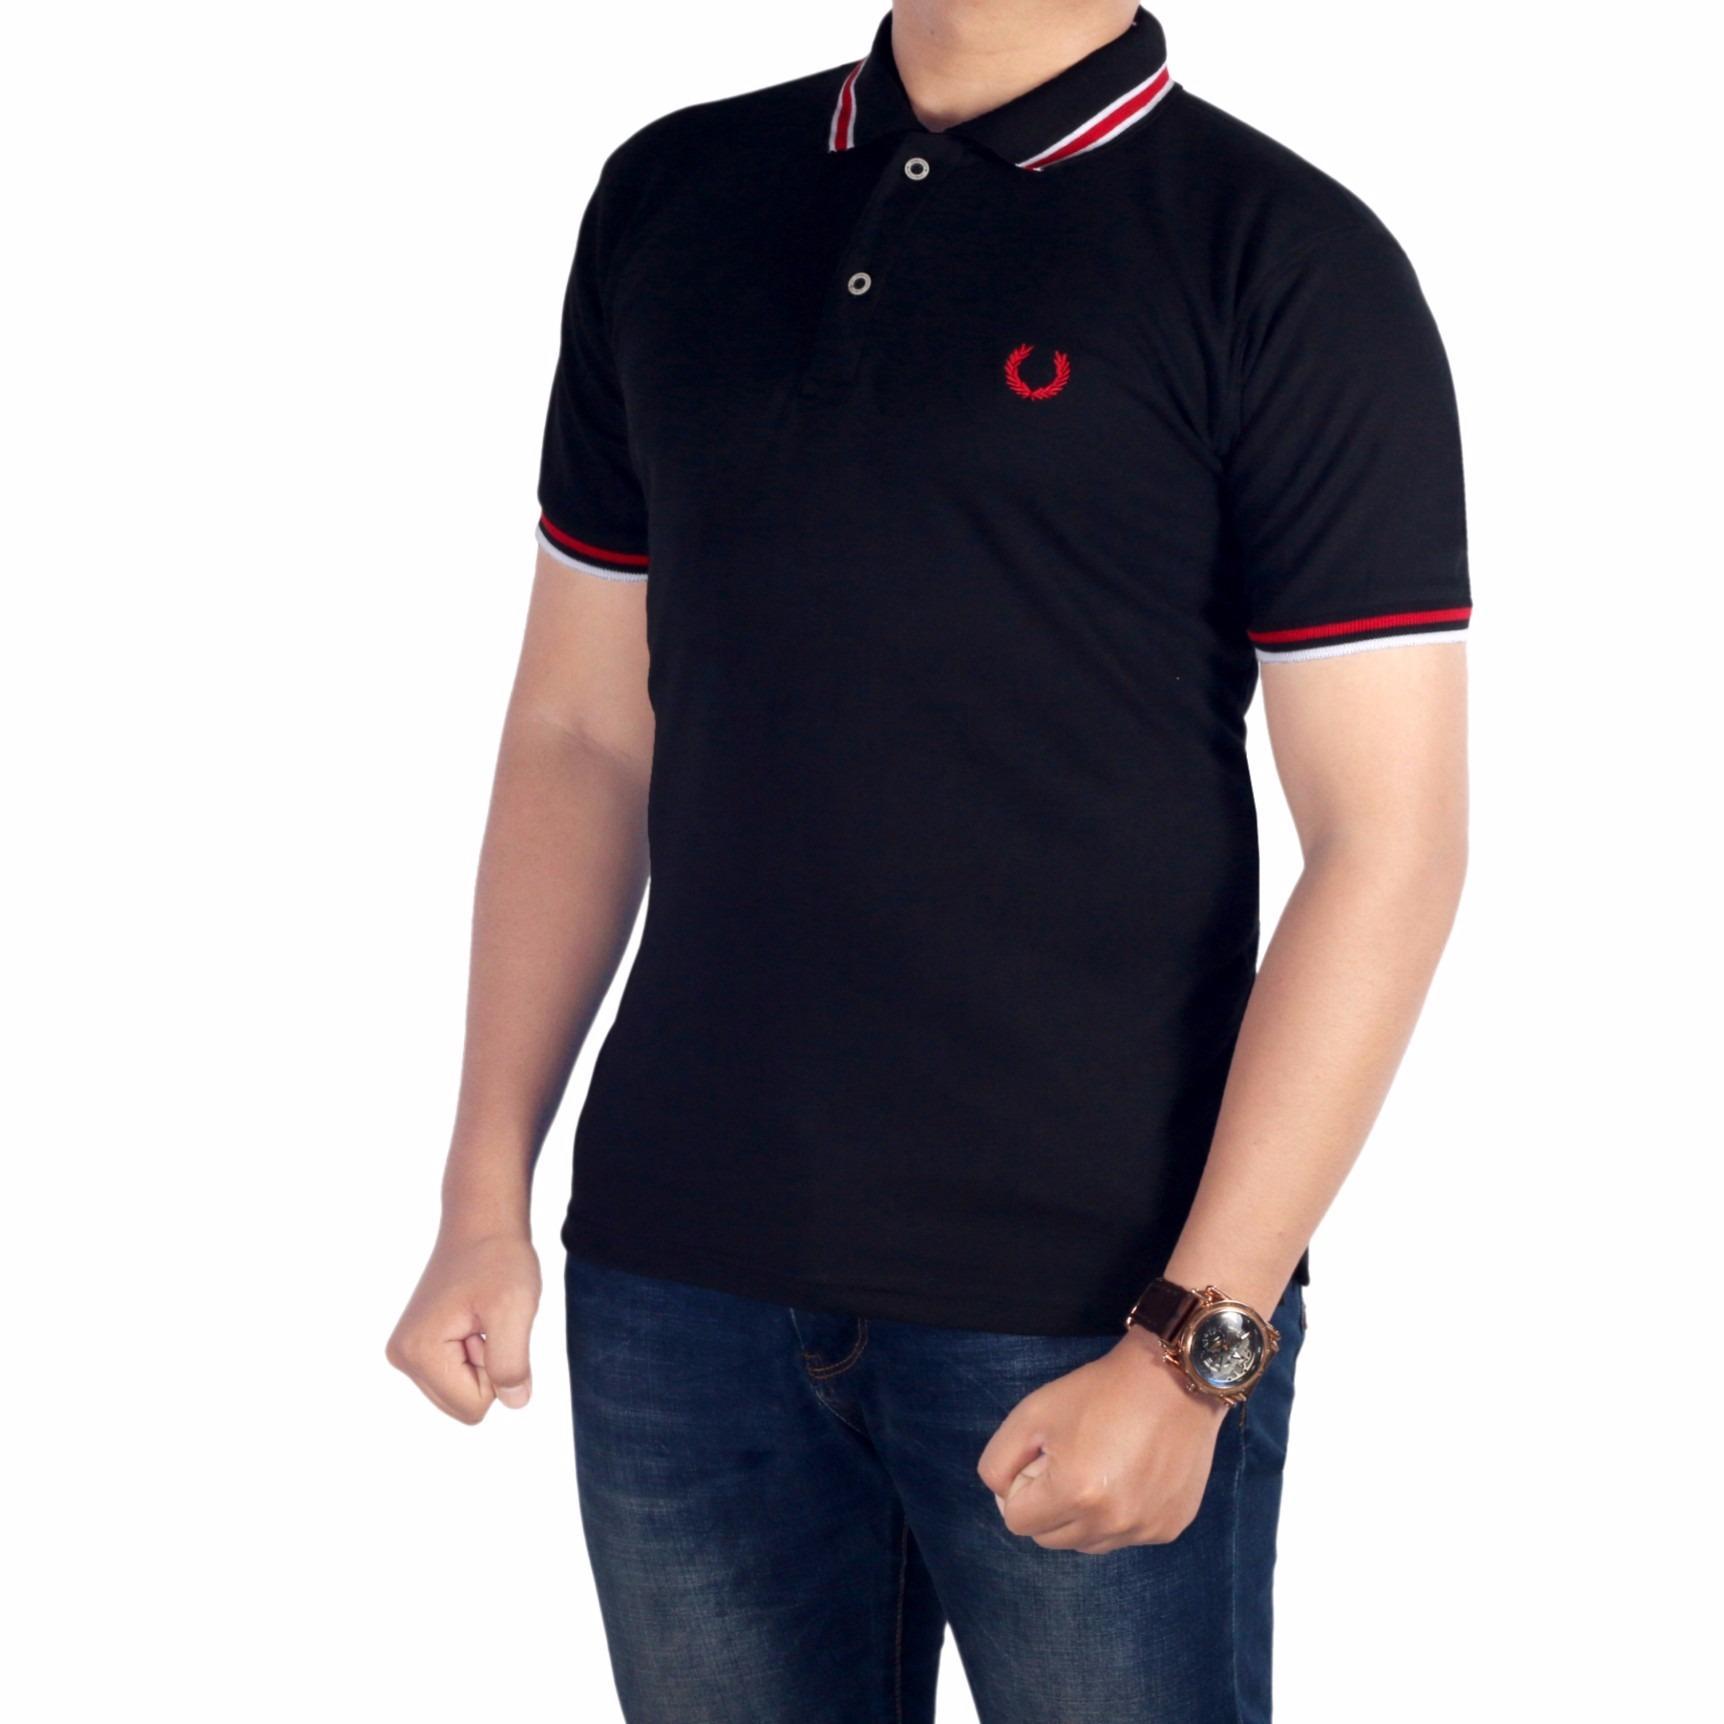 Spek Dgm Fashion1 Baju Kaos Polo Hitam Polos Baju Pantai Kaos Pantai Kaos Polo Pantai Polo Shirt Kerah Sanghai Tribal Polo Shirt Polos Kaos Polos Polo Kaos Polo Kaos Polo Berkerah Kaos Polo Polos Kaos Kerah Polo Shirt Kaos Polo Pria Iu 3907